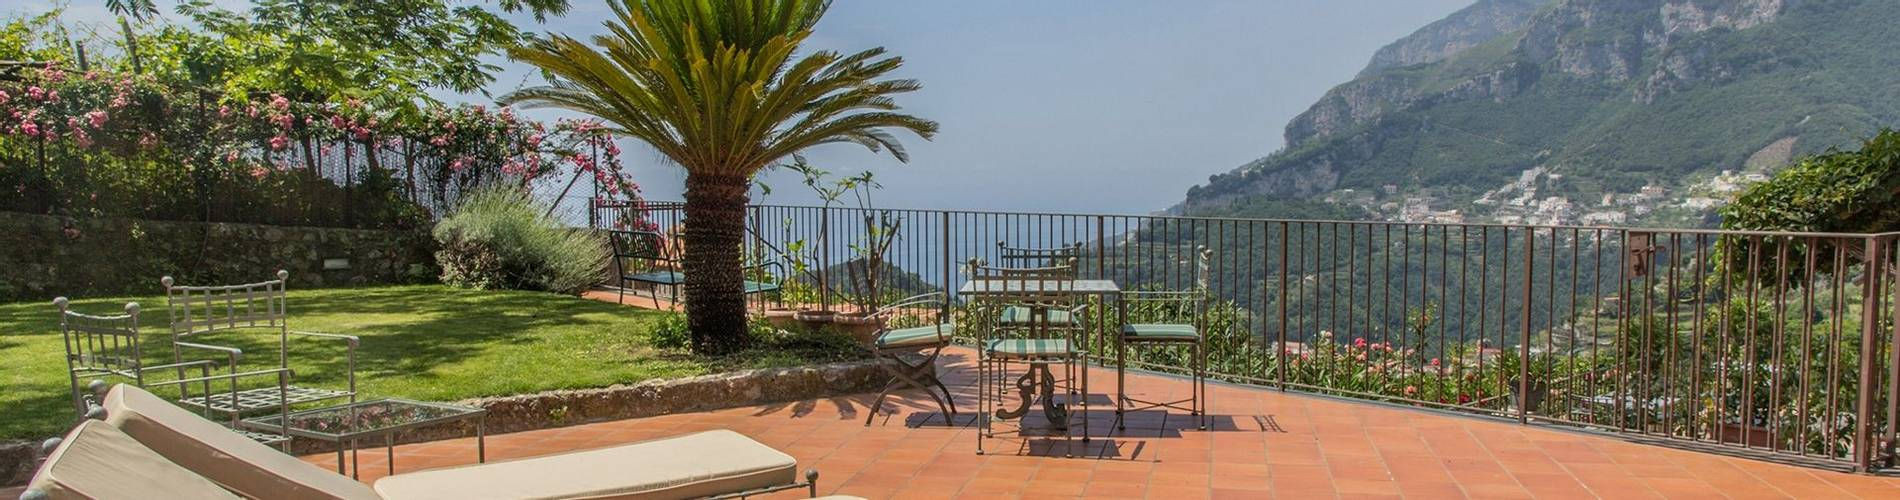 Villa Maria, Amalfi Coast, Italy, Solarium.jpg